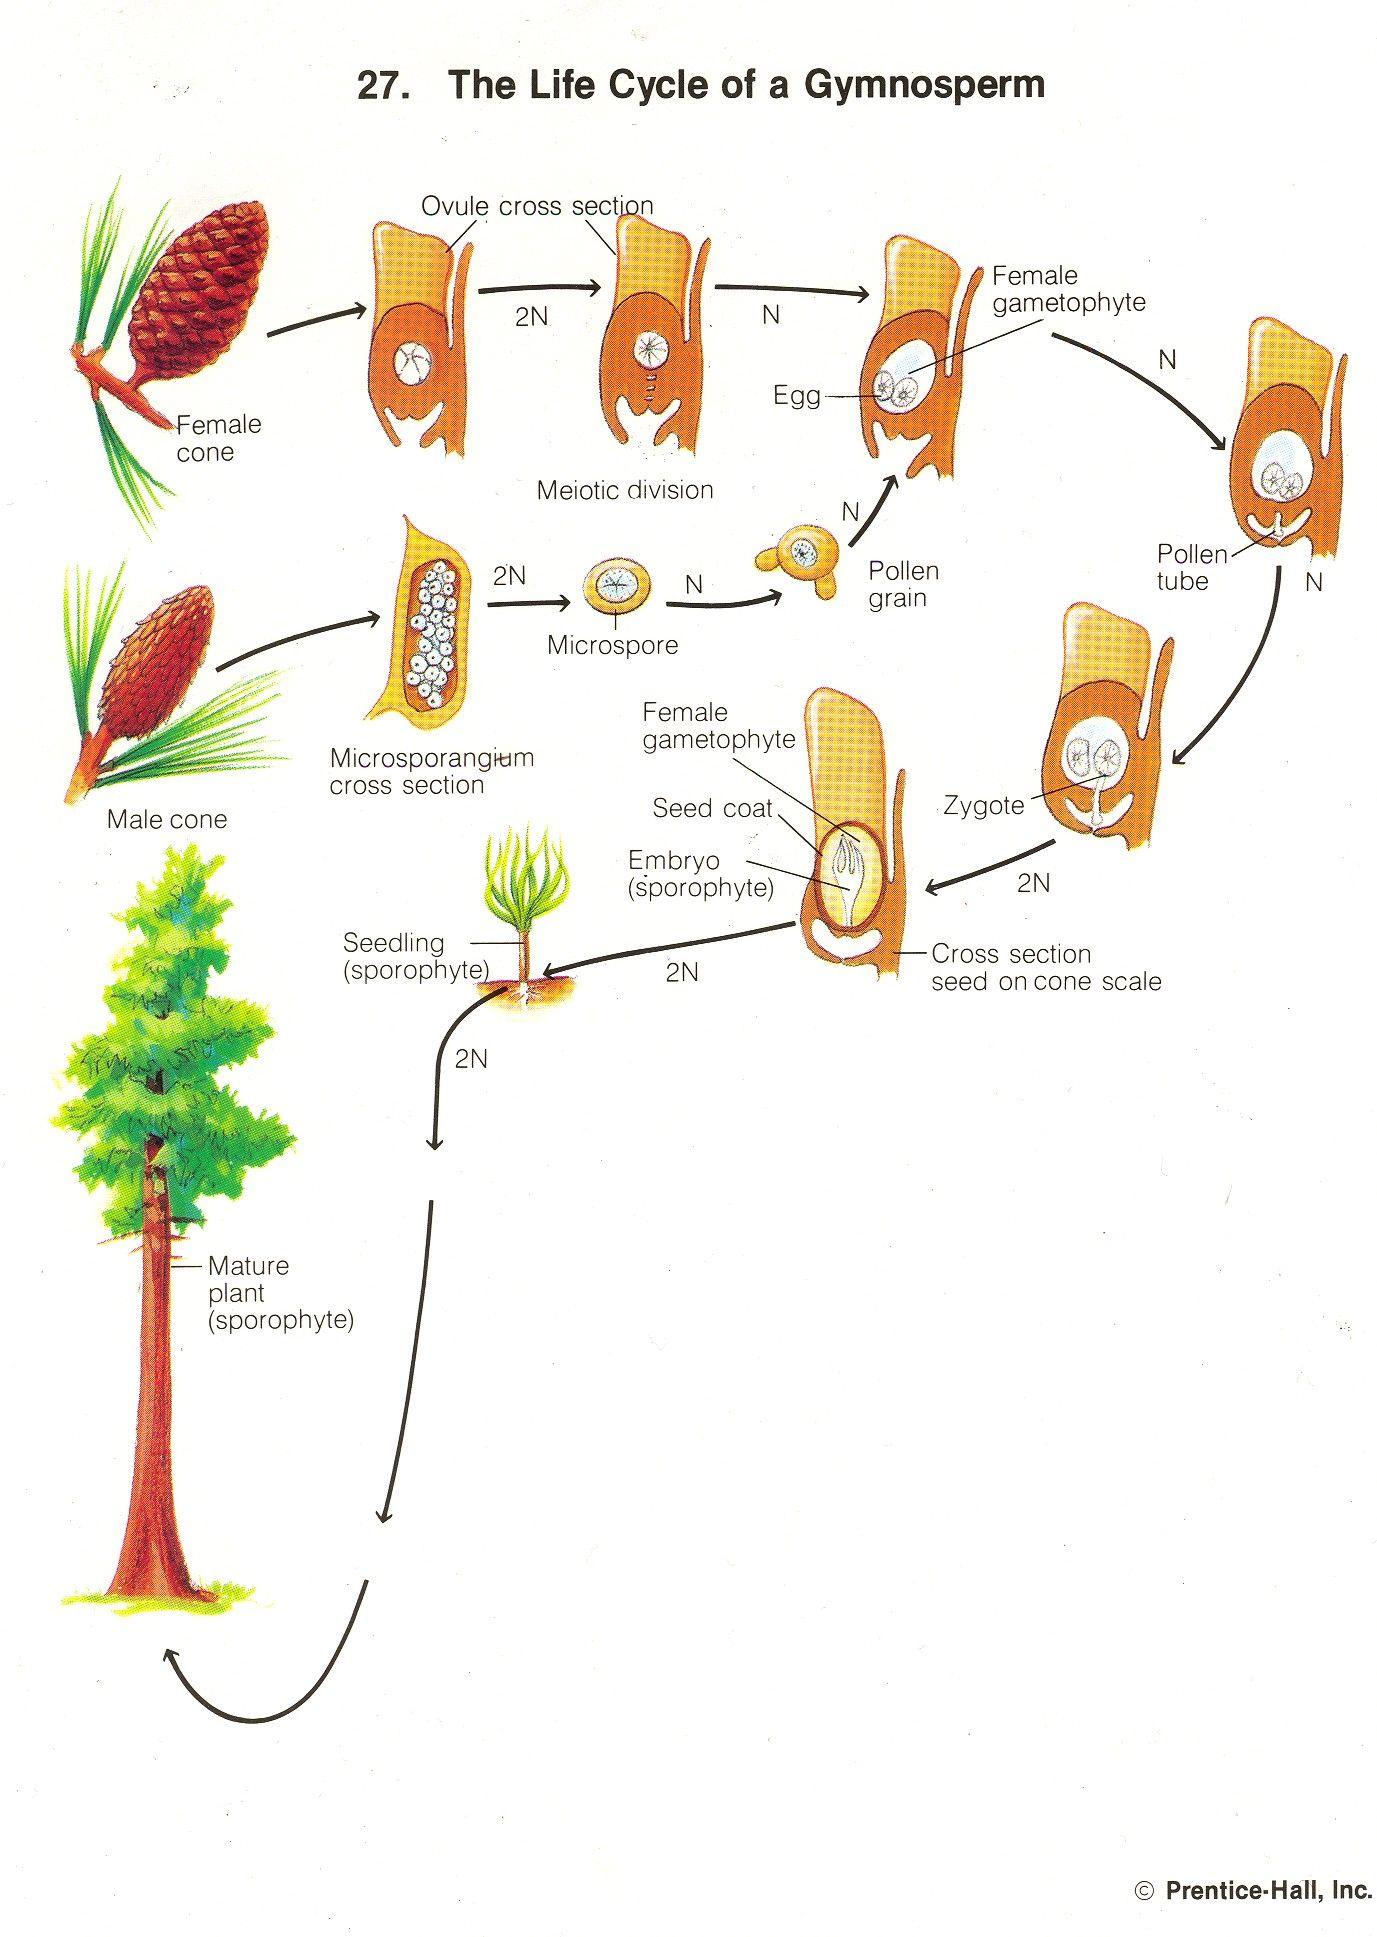 gymnosperm life cycle horticulture pinterest botanique montessori et herbe. Black Bedroom Furniture Sets. Home Design Ideas